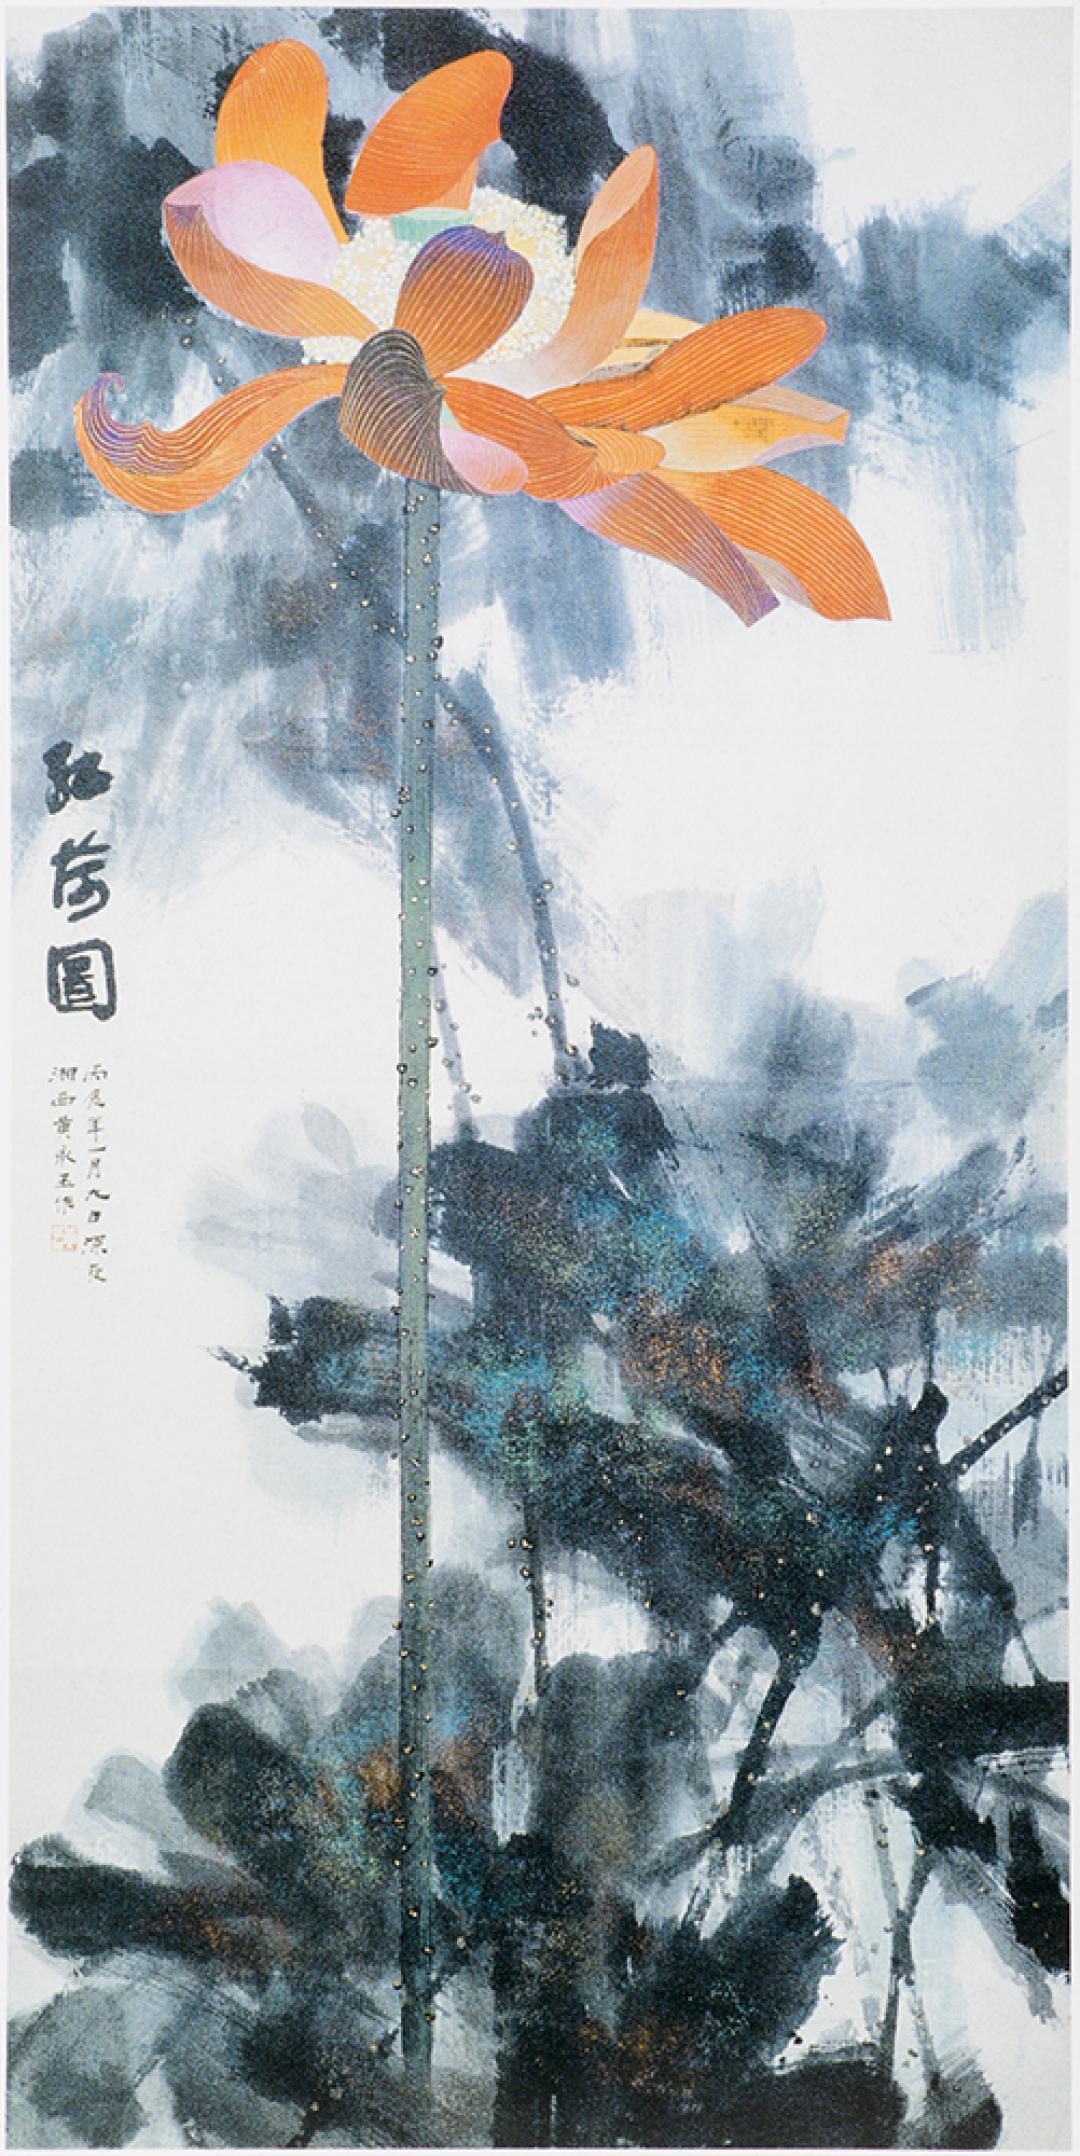 Huang Yongyu, Red Lotus Honoring Zhou Enlai